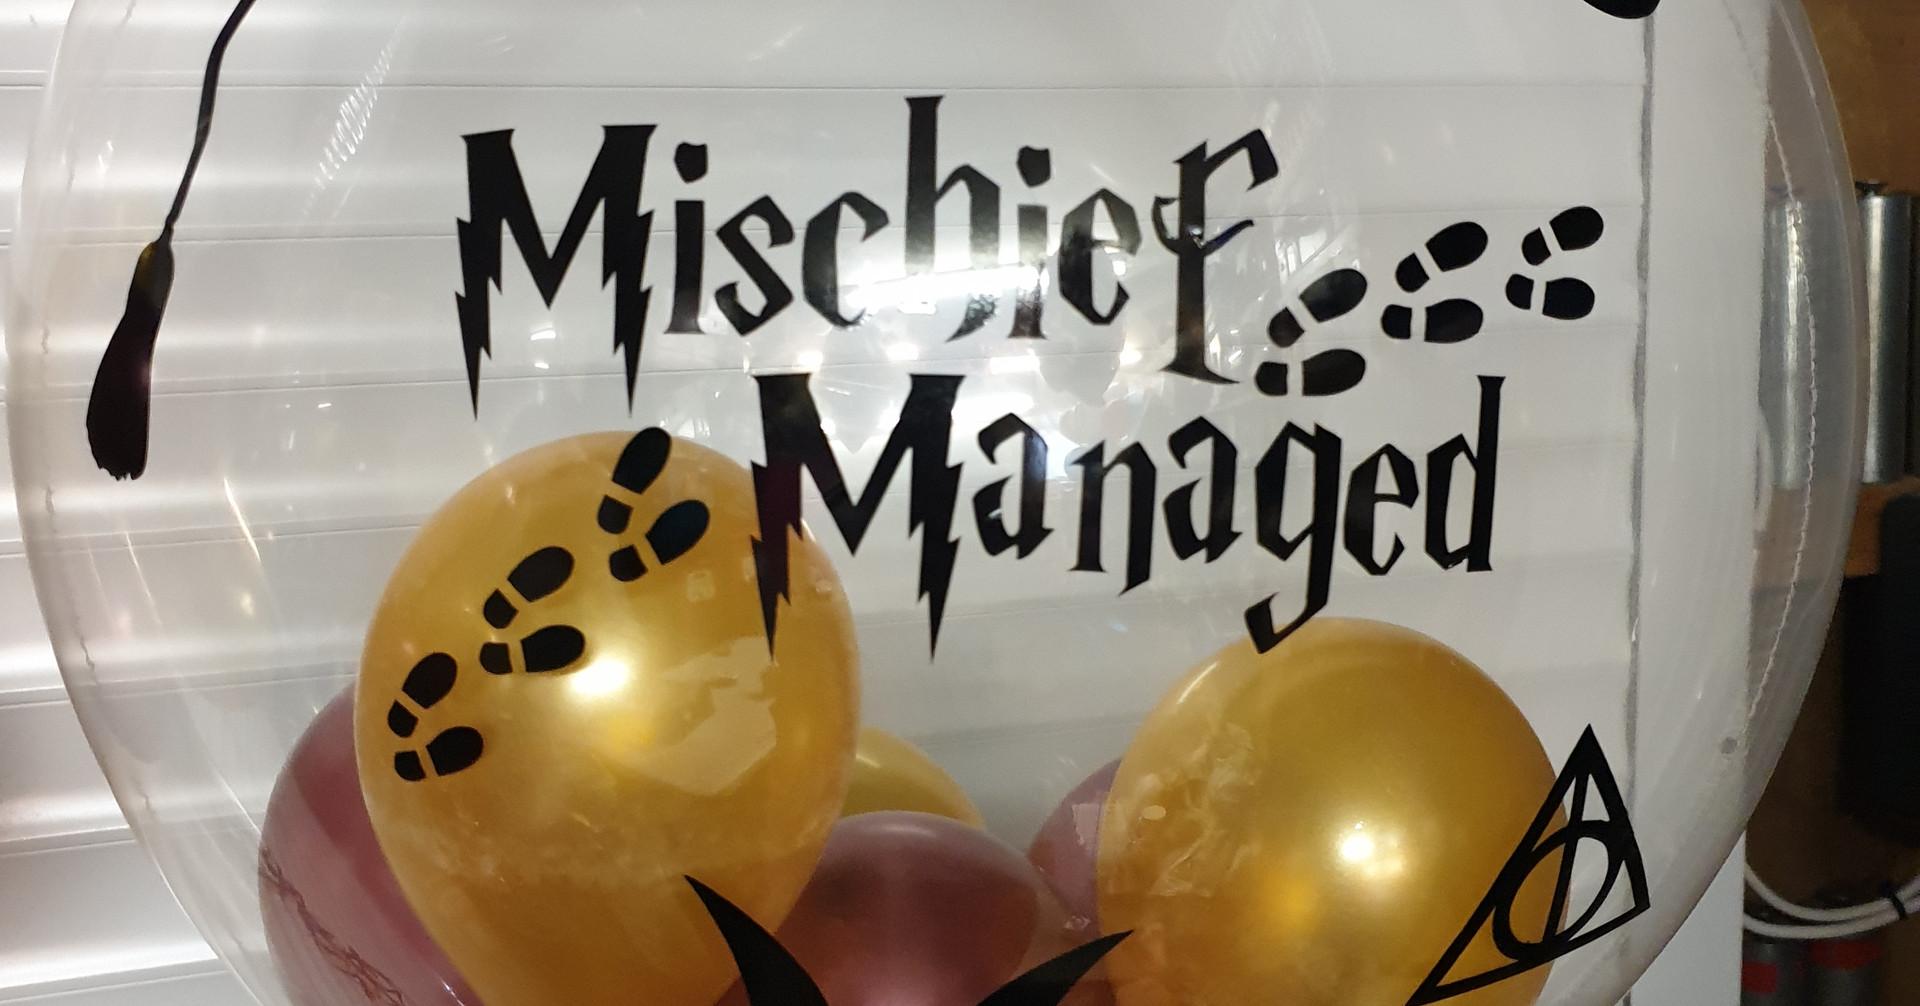 Mischeif managed bubble balloon